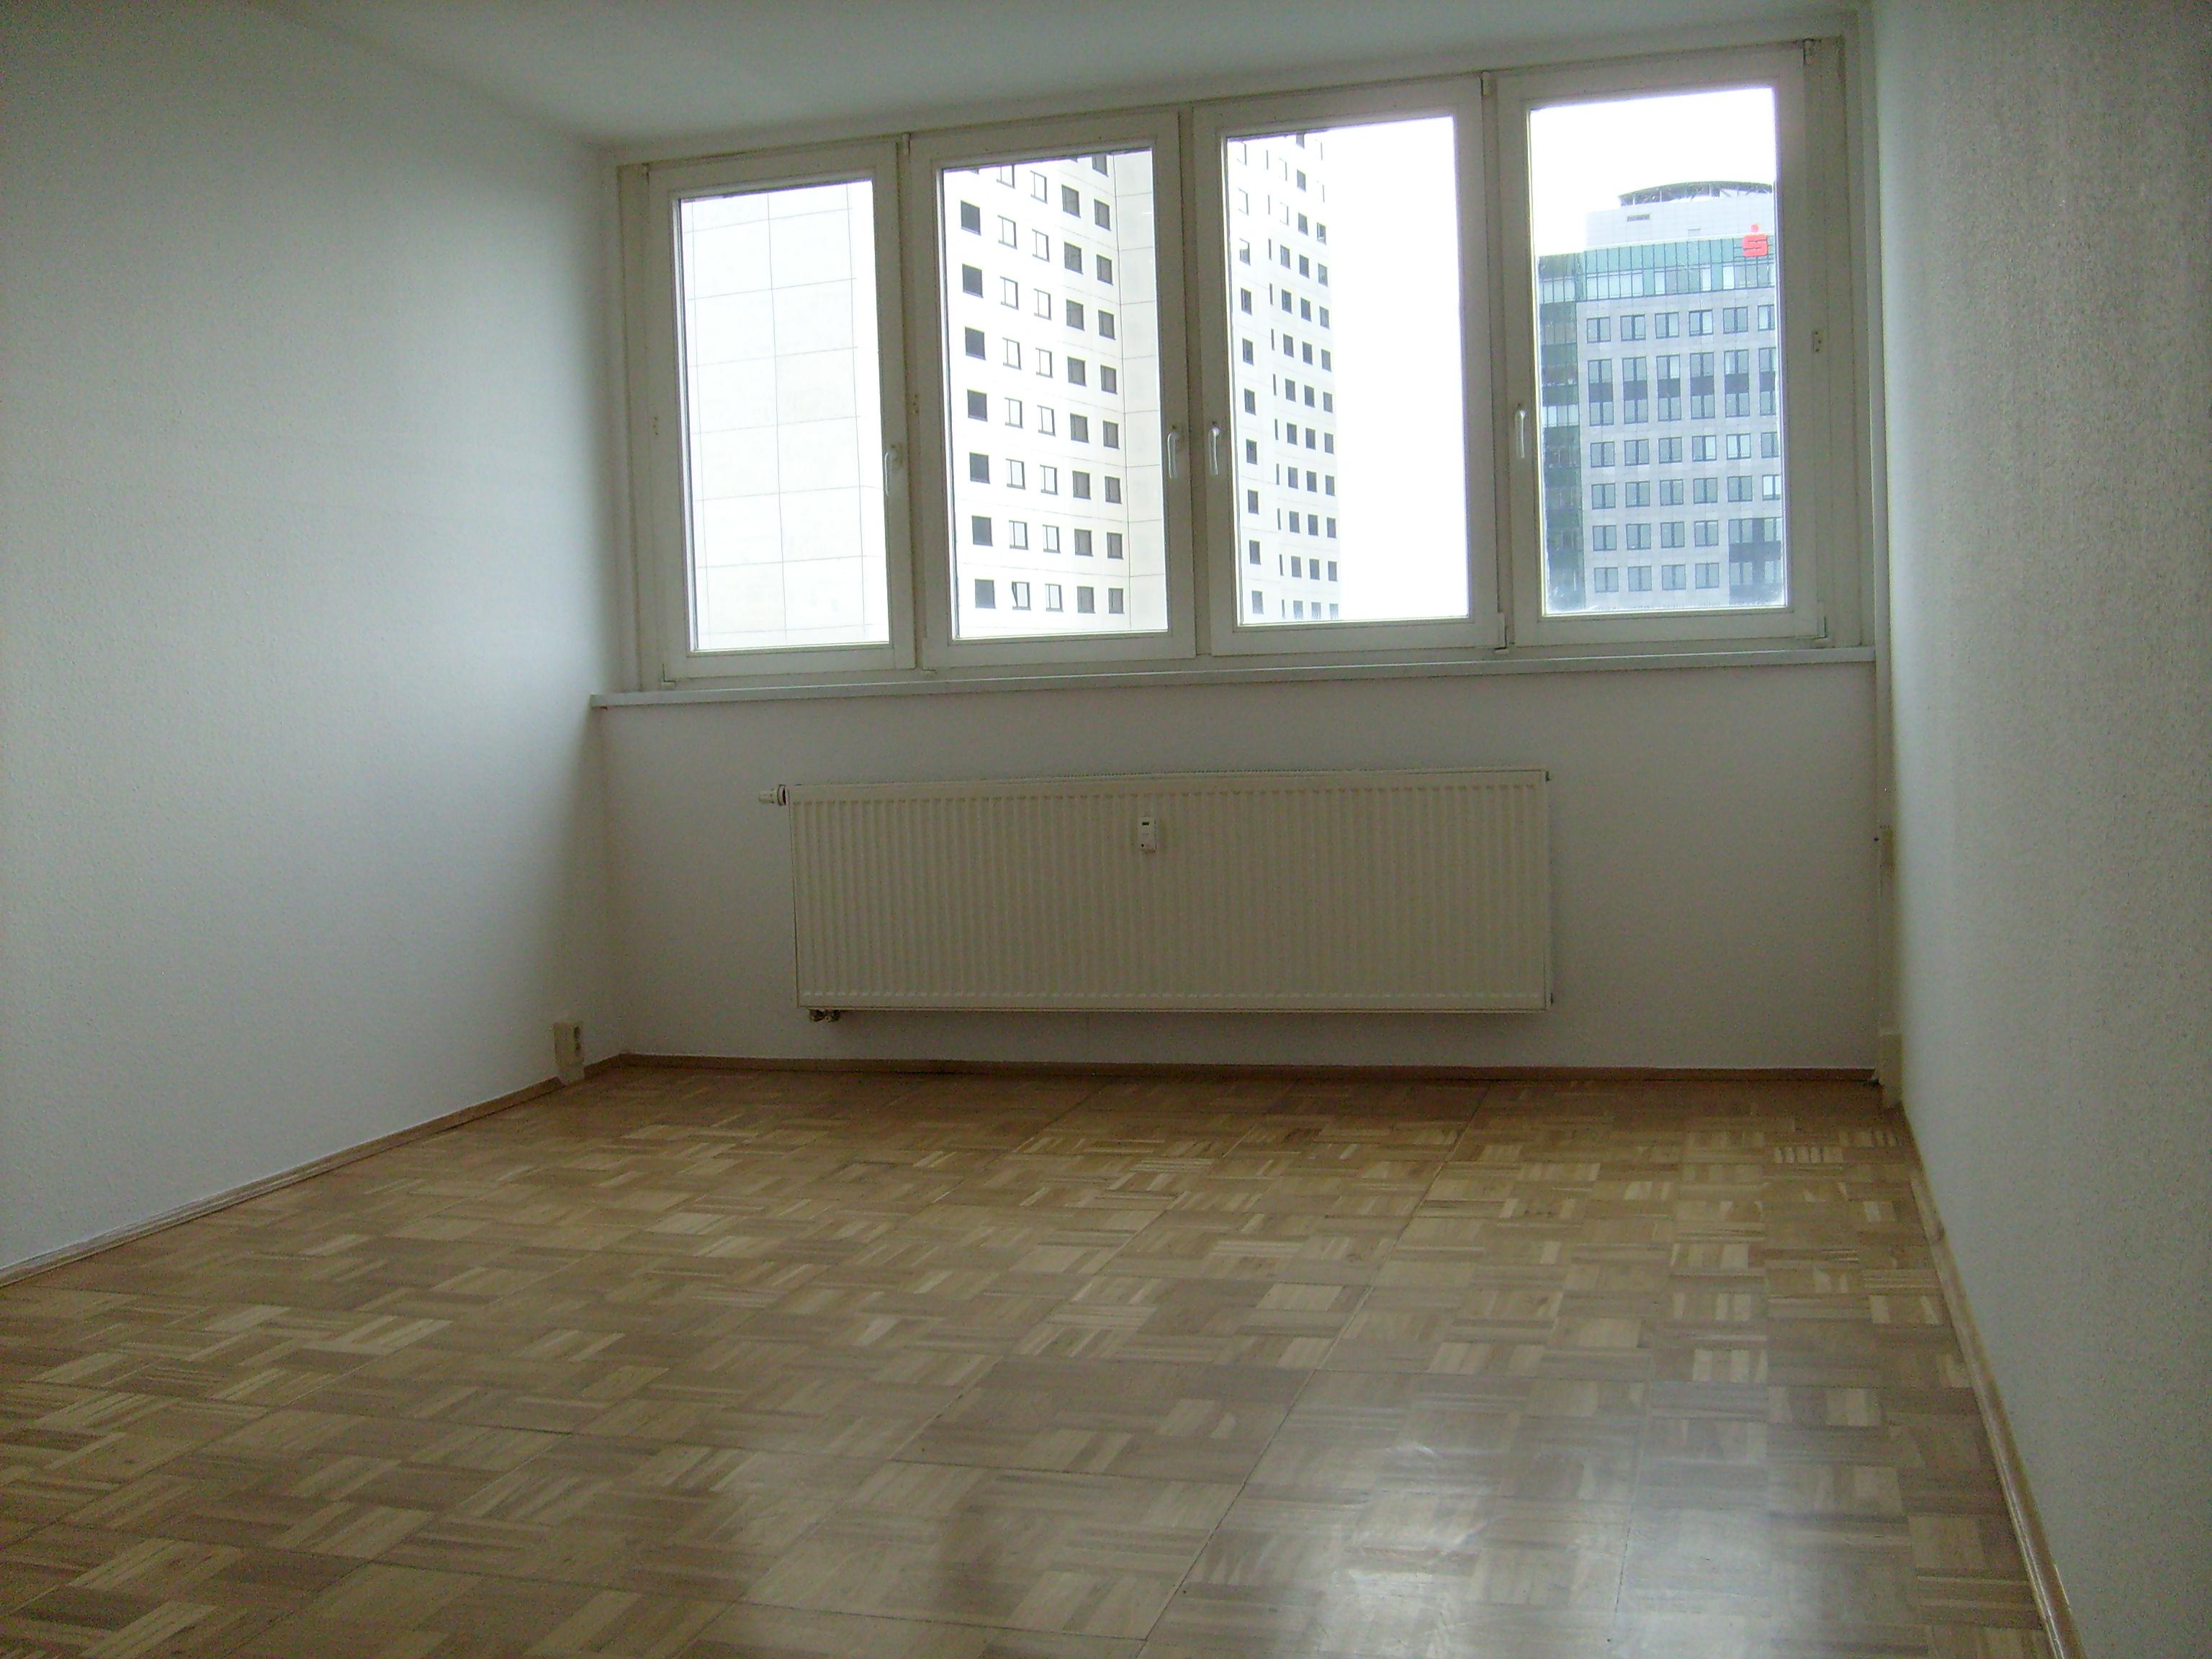 2 zimmer wohnung 50 qm zentrale lage ganz oben. Black Bedroom Furniture Sets. Home Design Ideas